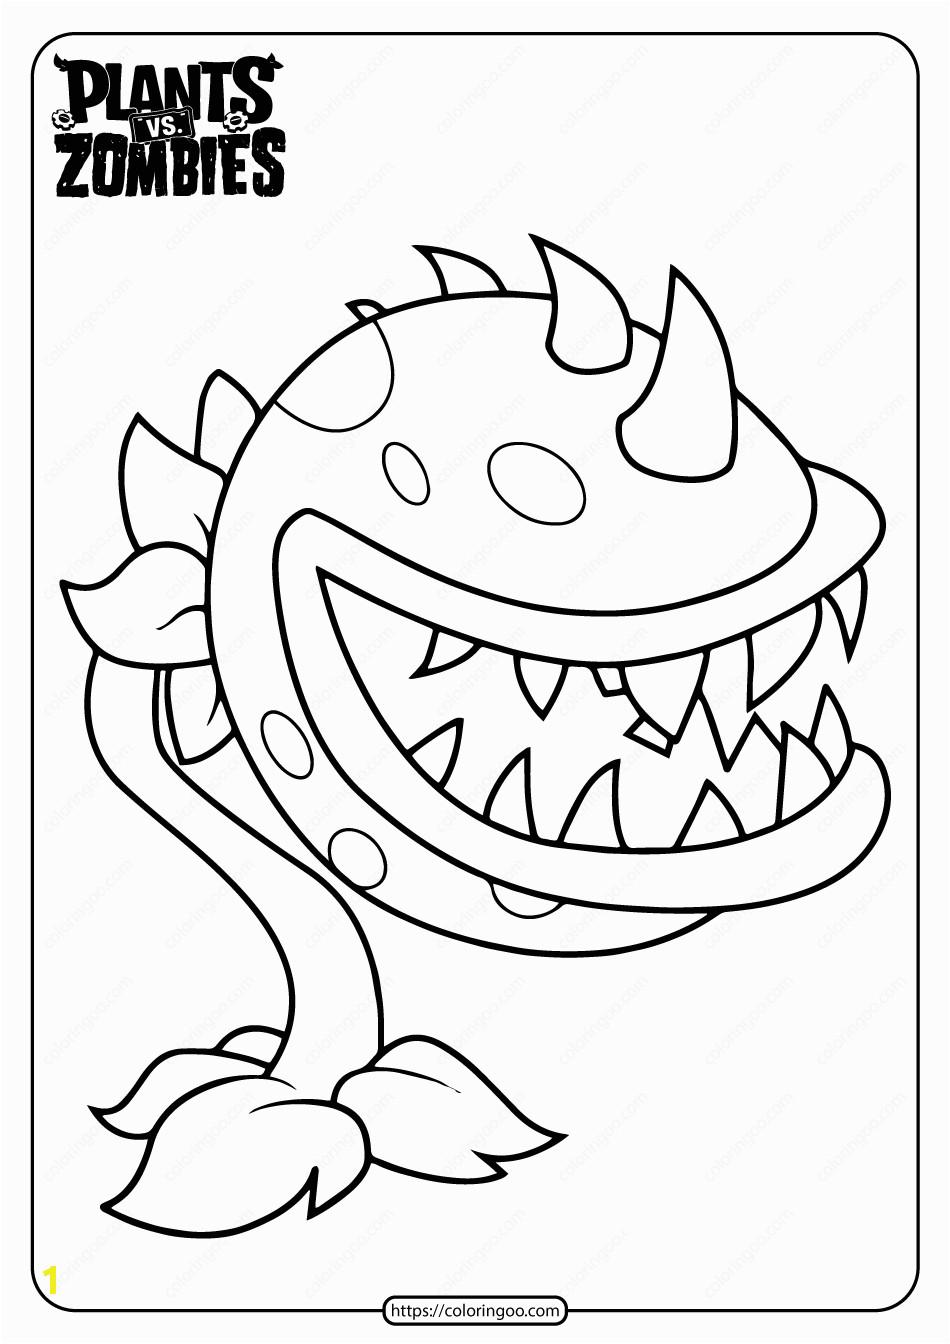 plants vs zombies chomper pdf coloring page